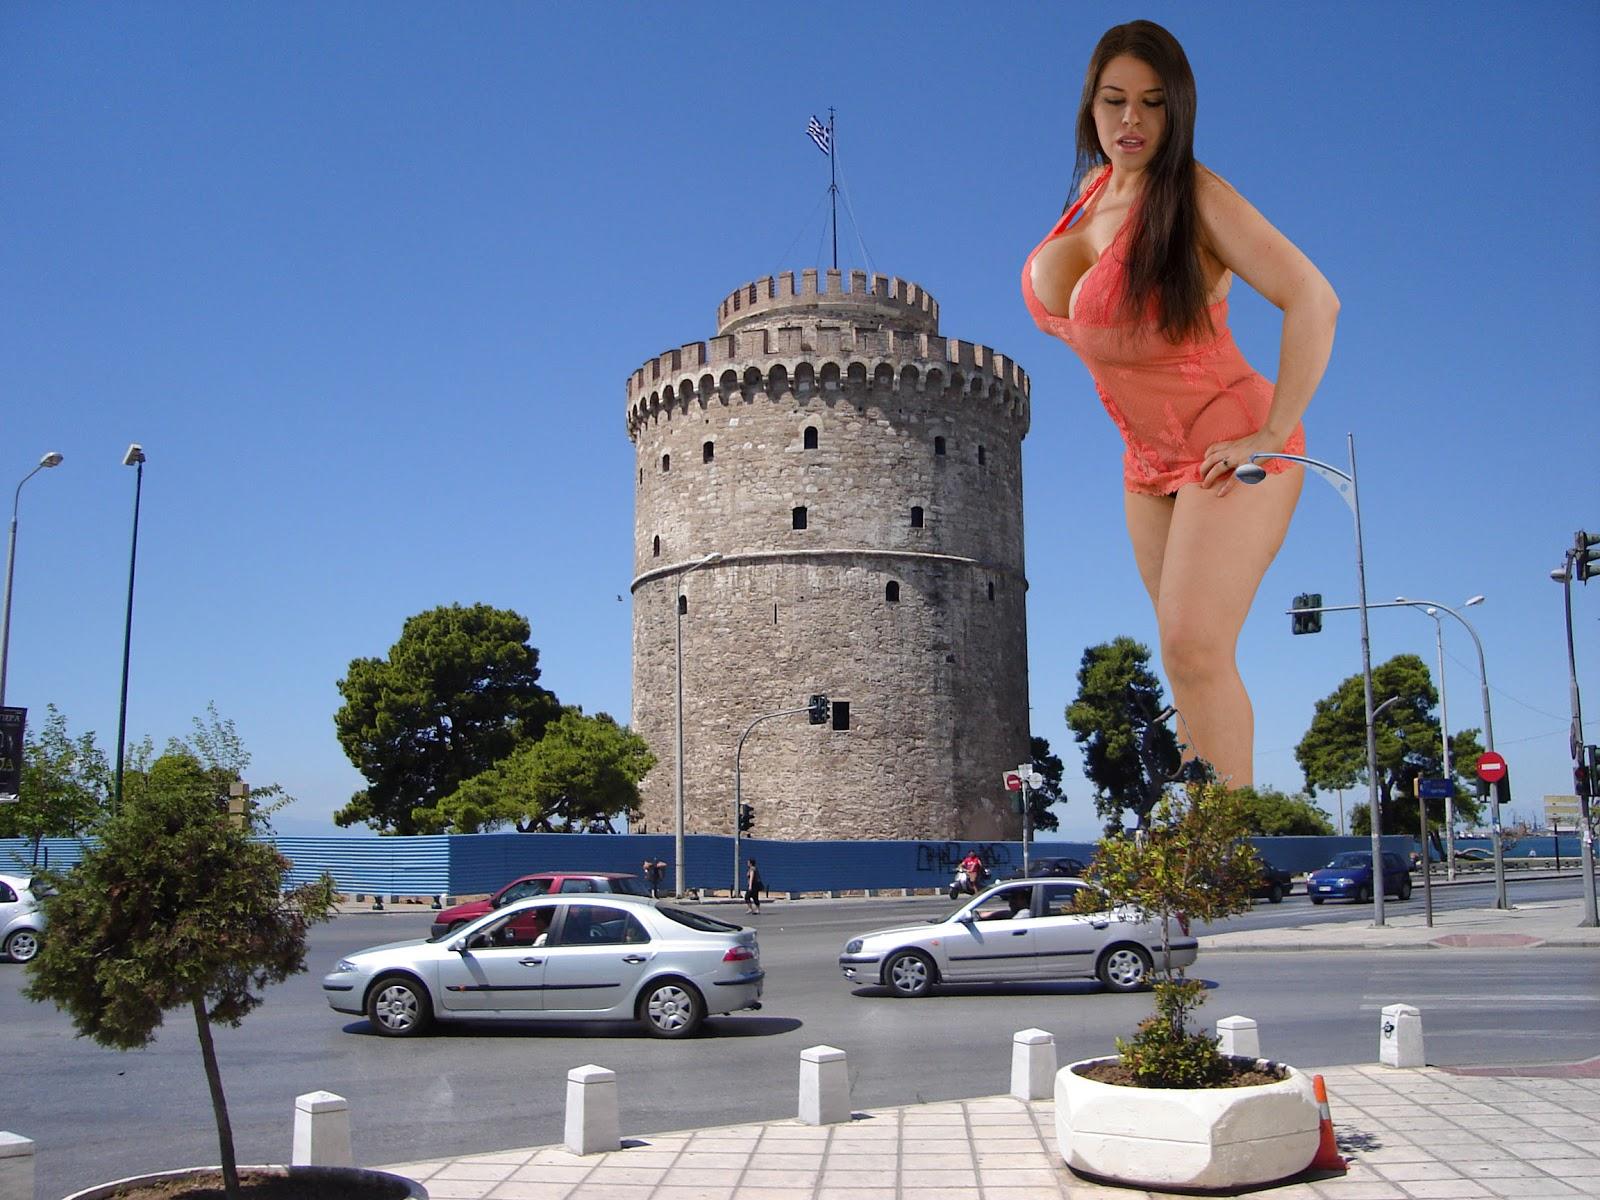 Giantess Dreamland: Giantess Daphne Rosen in Thesalloniki